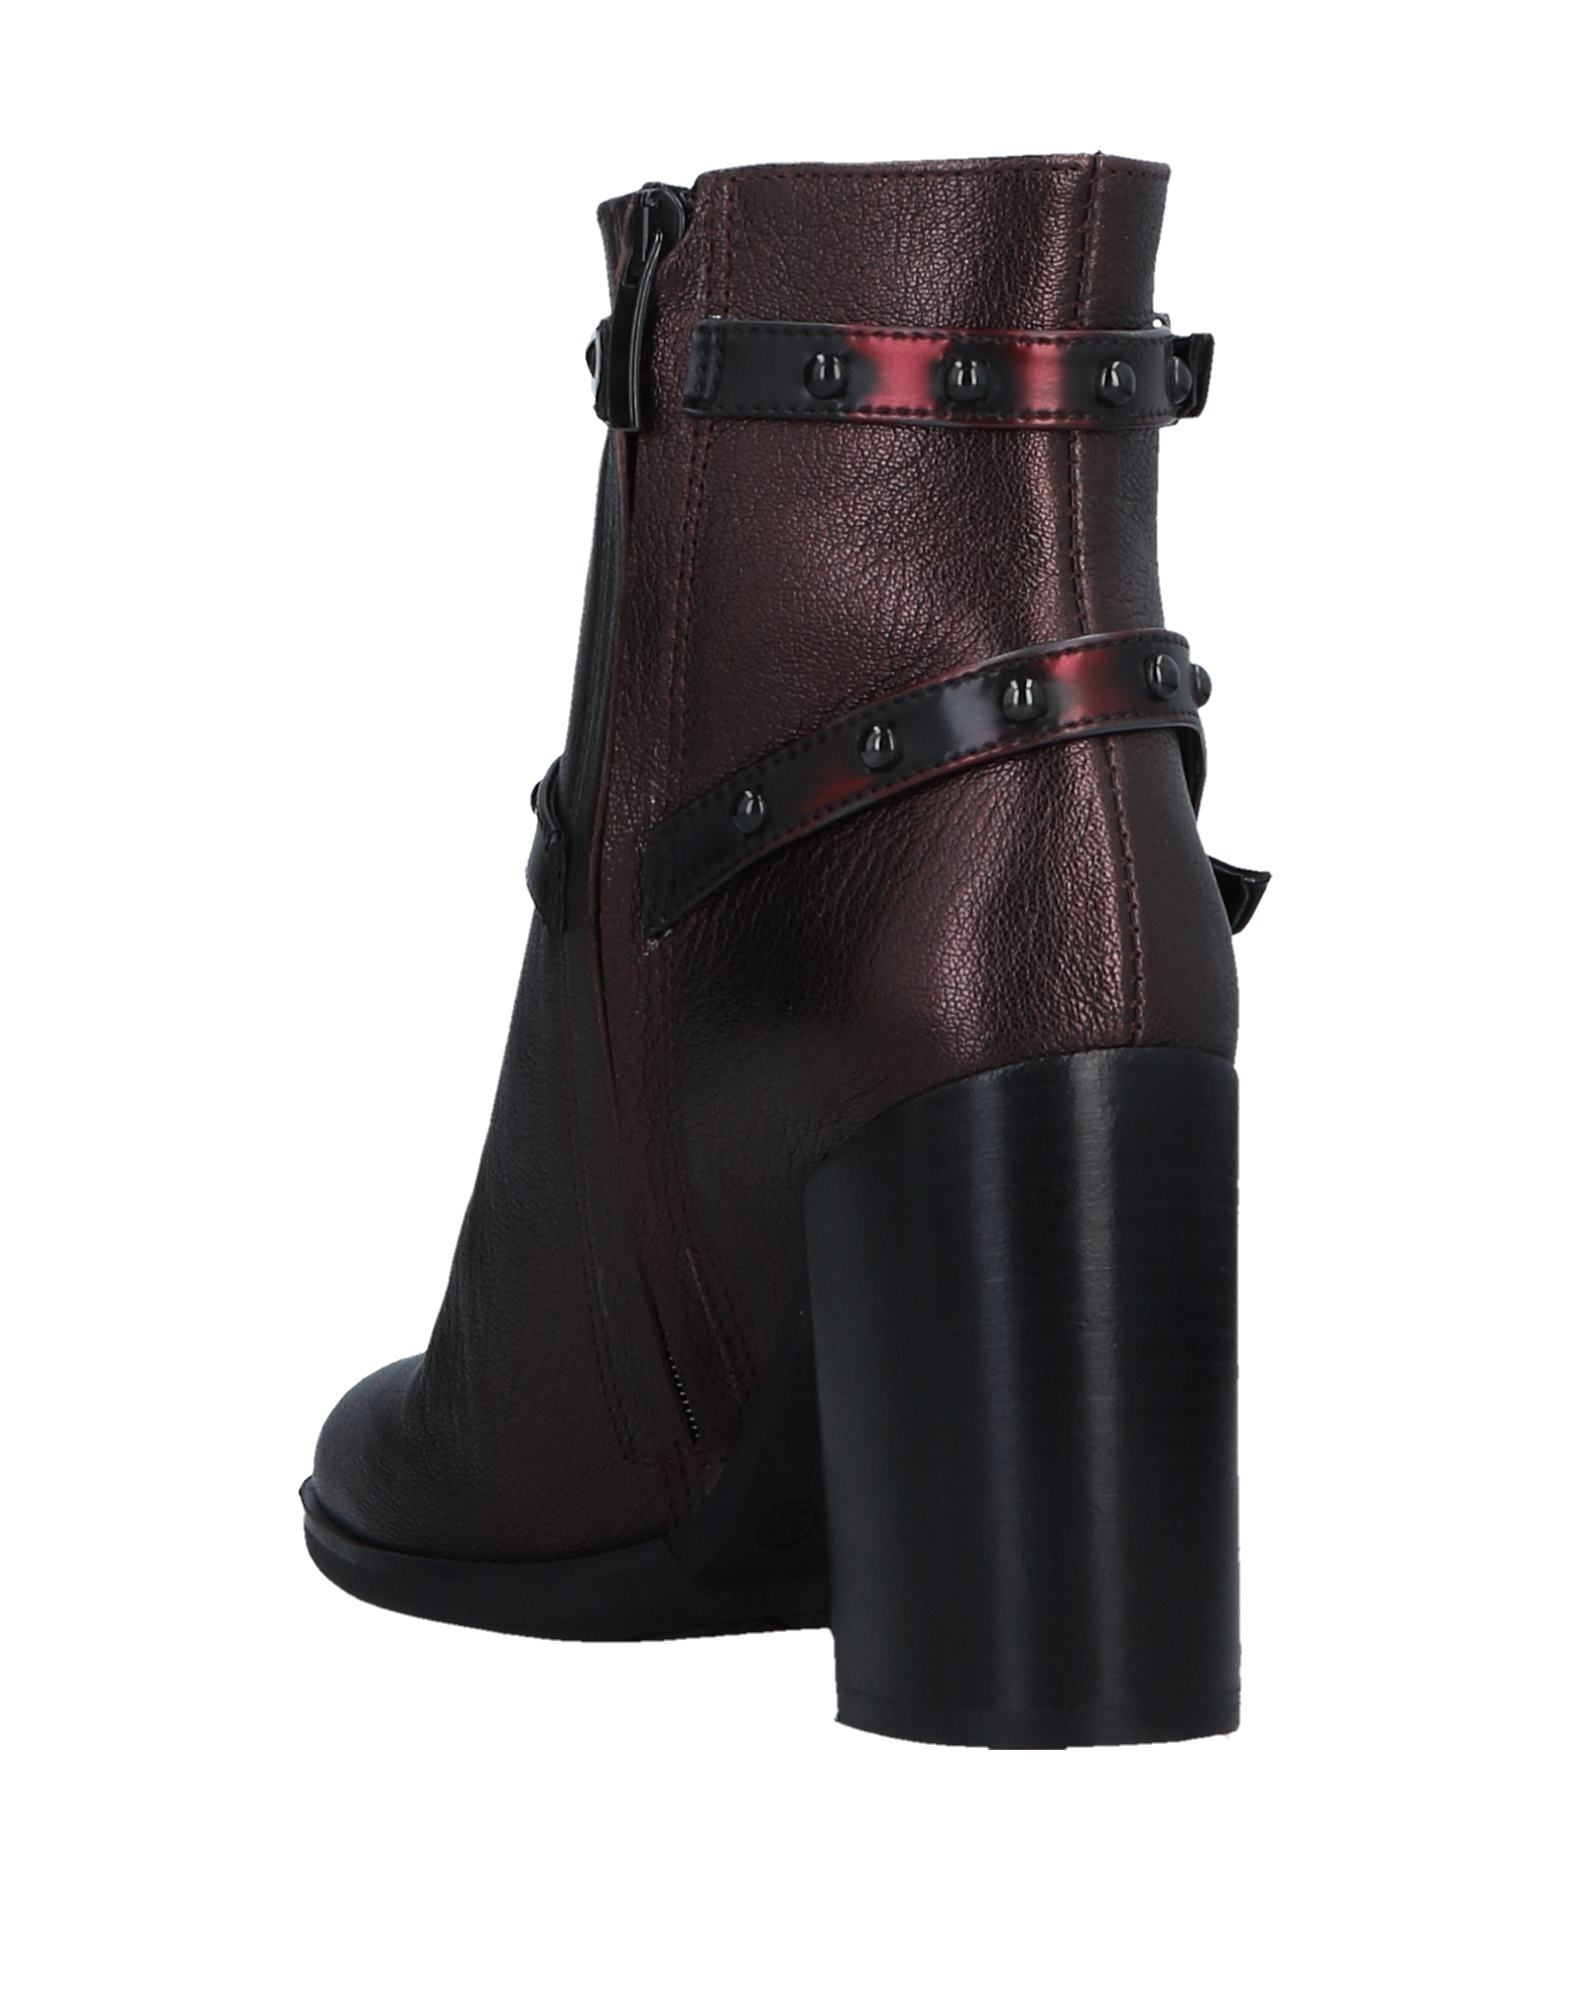 Lorenzo Mari Stiefelette Damen Schuhe 11529841EJ Gute Qualität beliebte Schuhe Damen 828e19